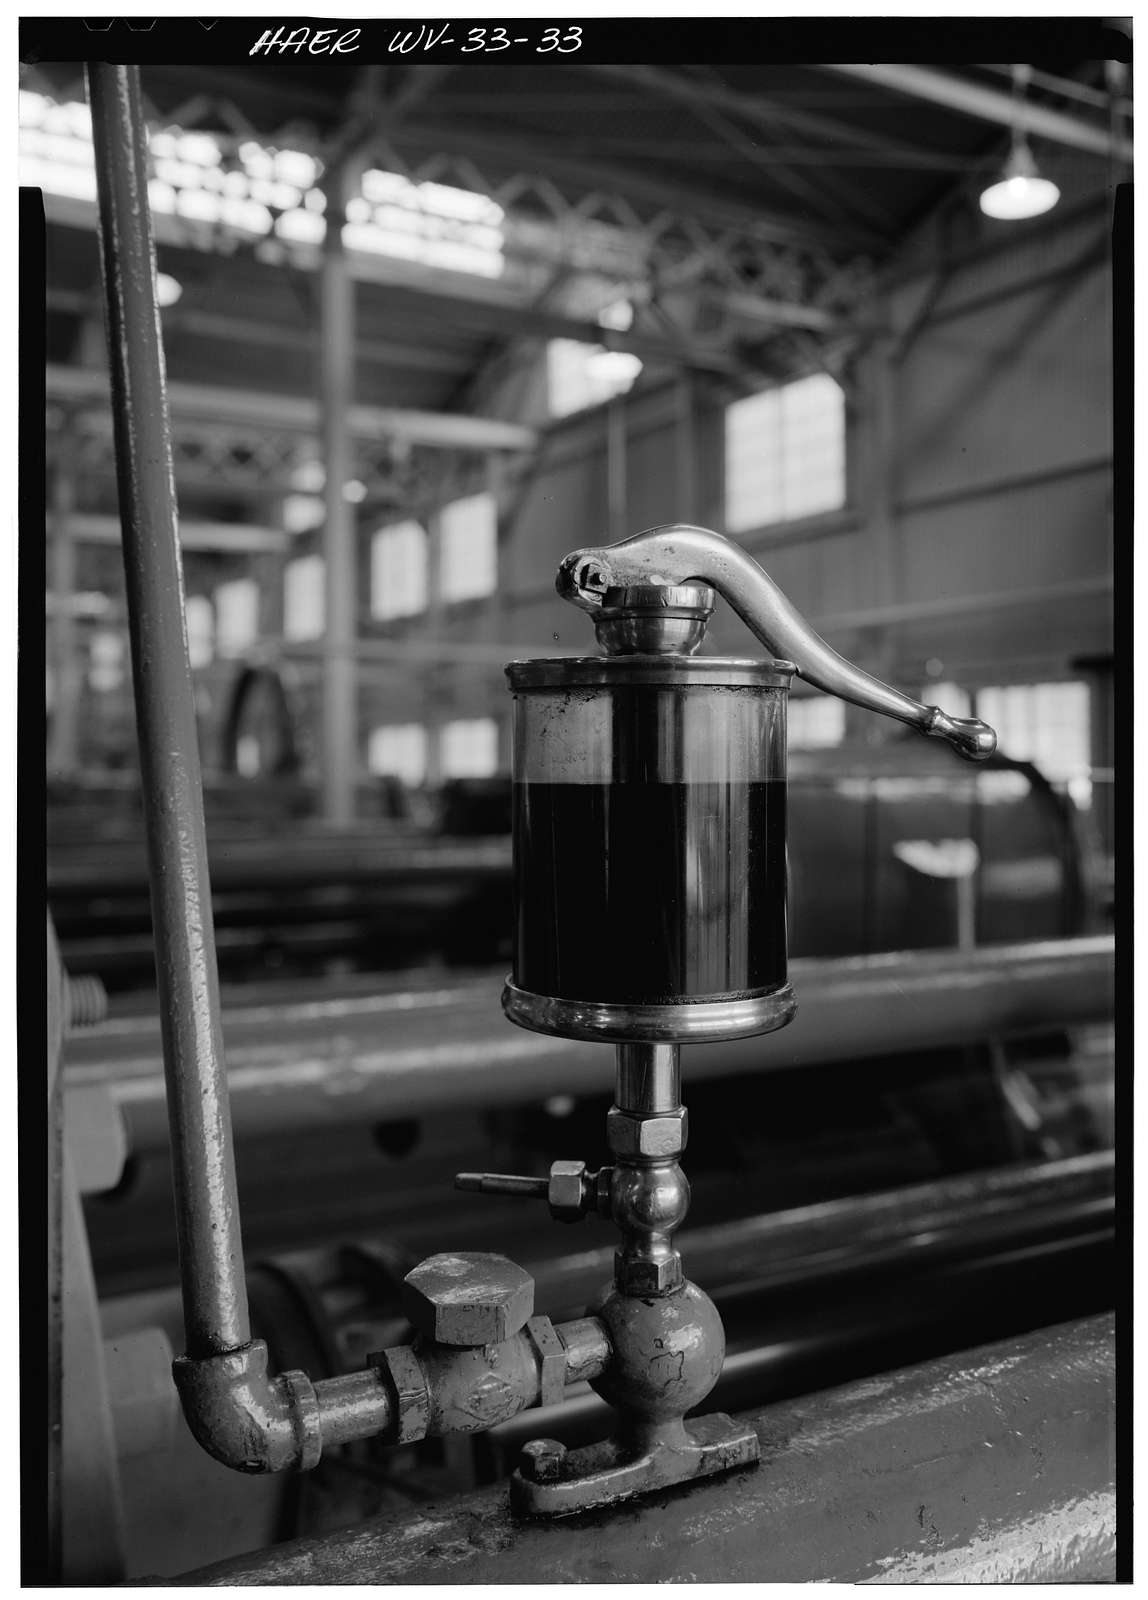 Burnsville Natural Gas Pumping Station, Saratoga Avenue between Little Kanawha River & C&O Railroad line, Burnsville, Braxton County, WV